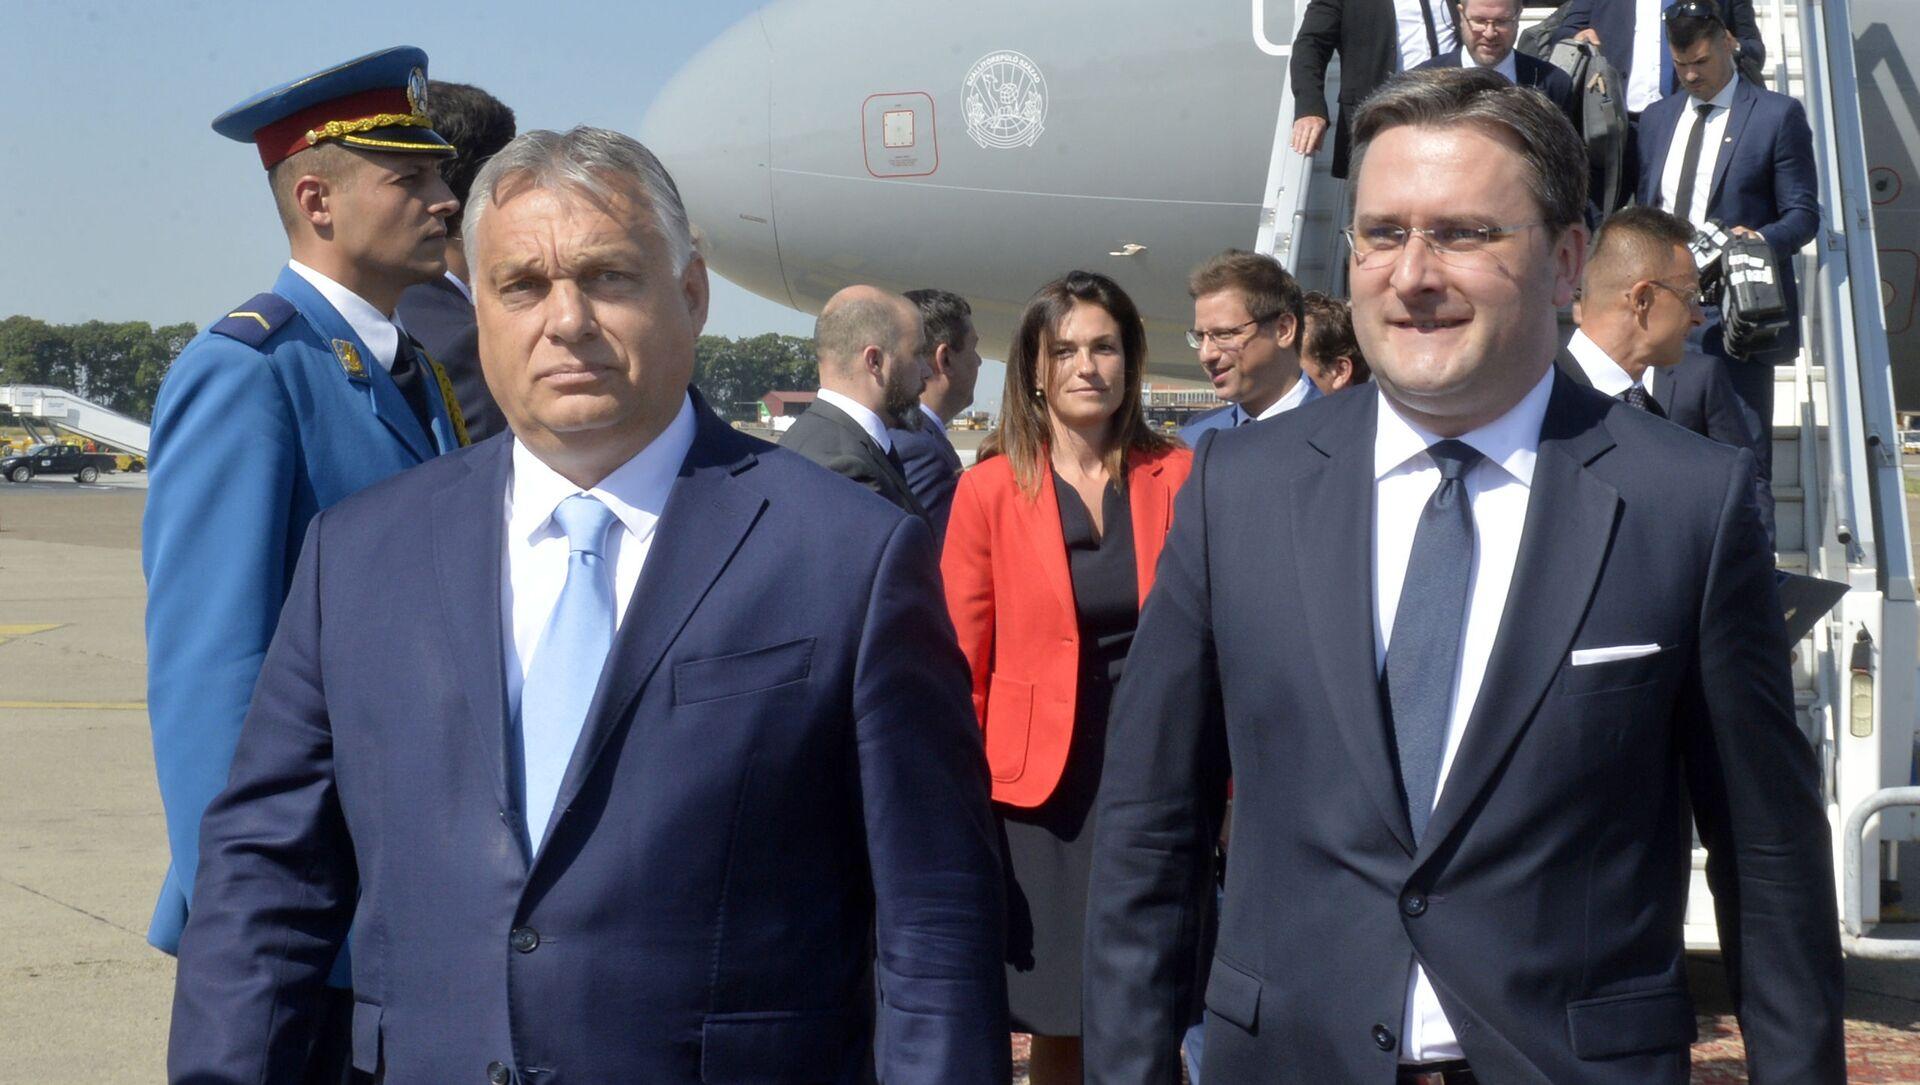 Виктор Орбан на београдском аеродрому са Николом Селаковићем - Sputnik Србија, 1920, 08.07.2021